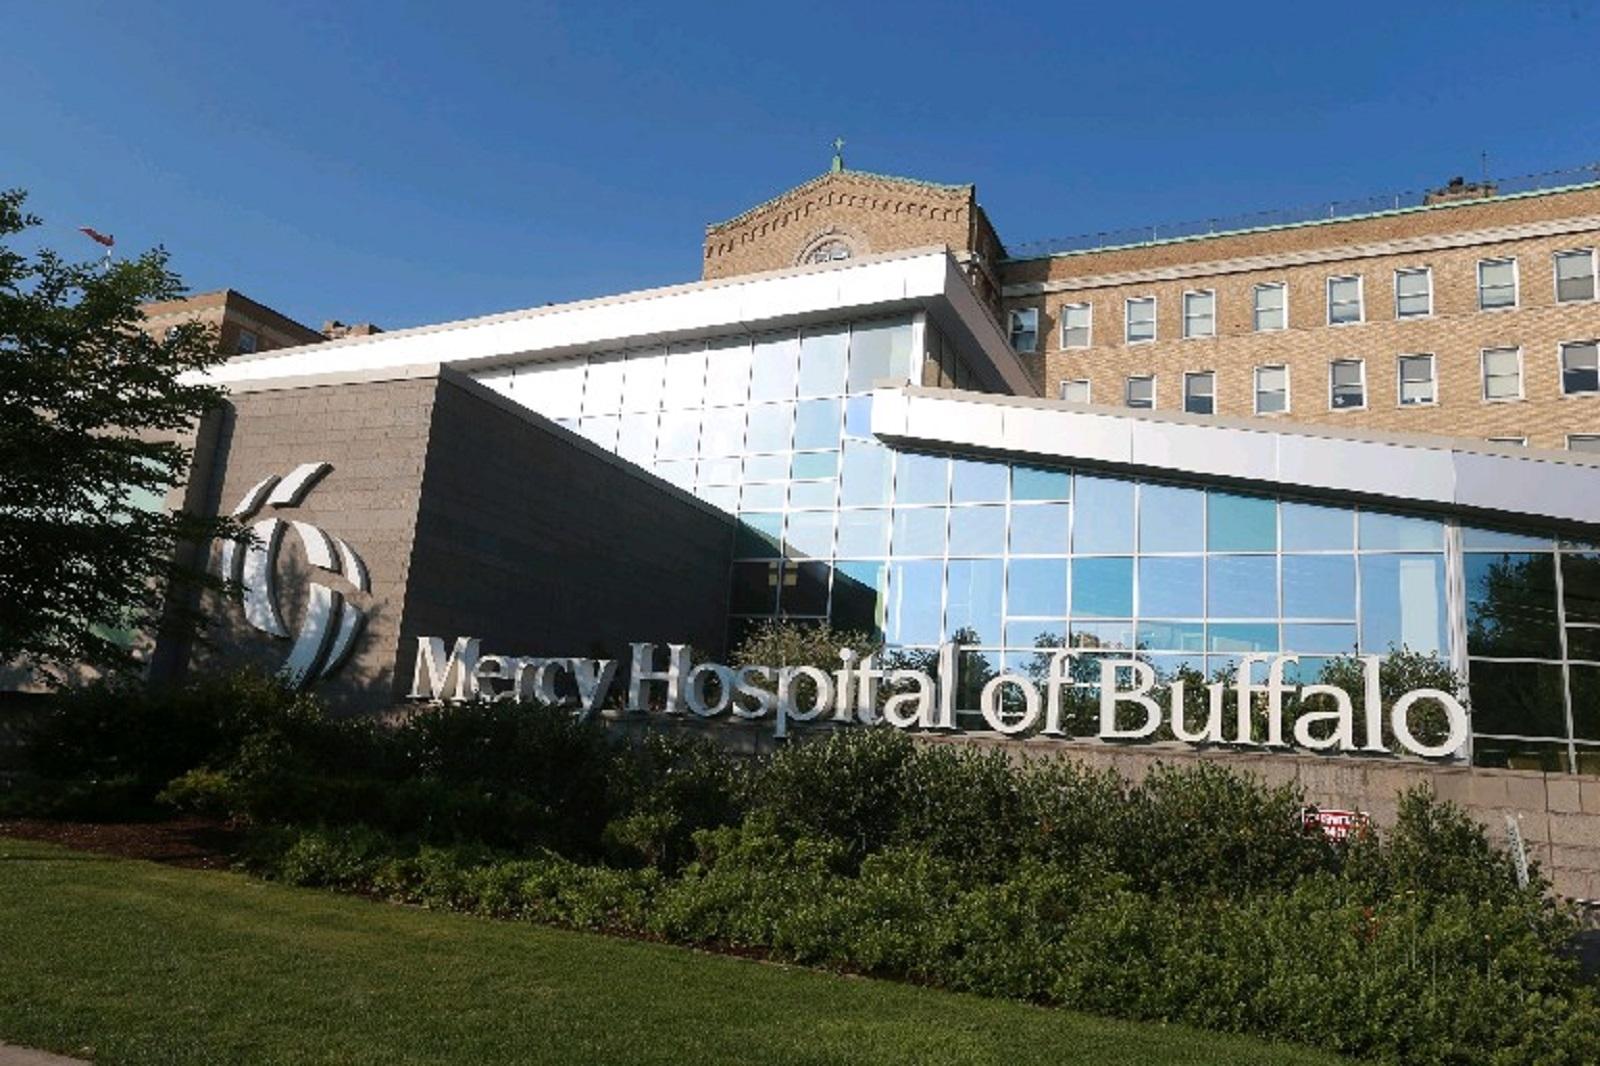 New Mercy Hospital grant will help address cardiovascular care in poor neighborhoods. (Robert Kirkham/Buffalo News file photo)